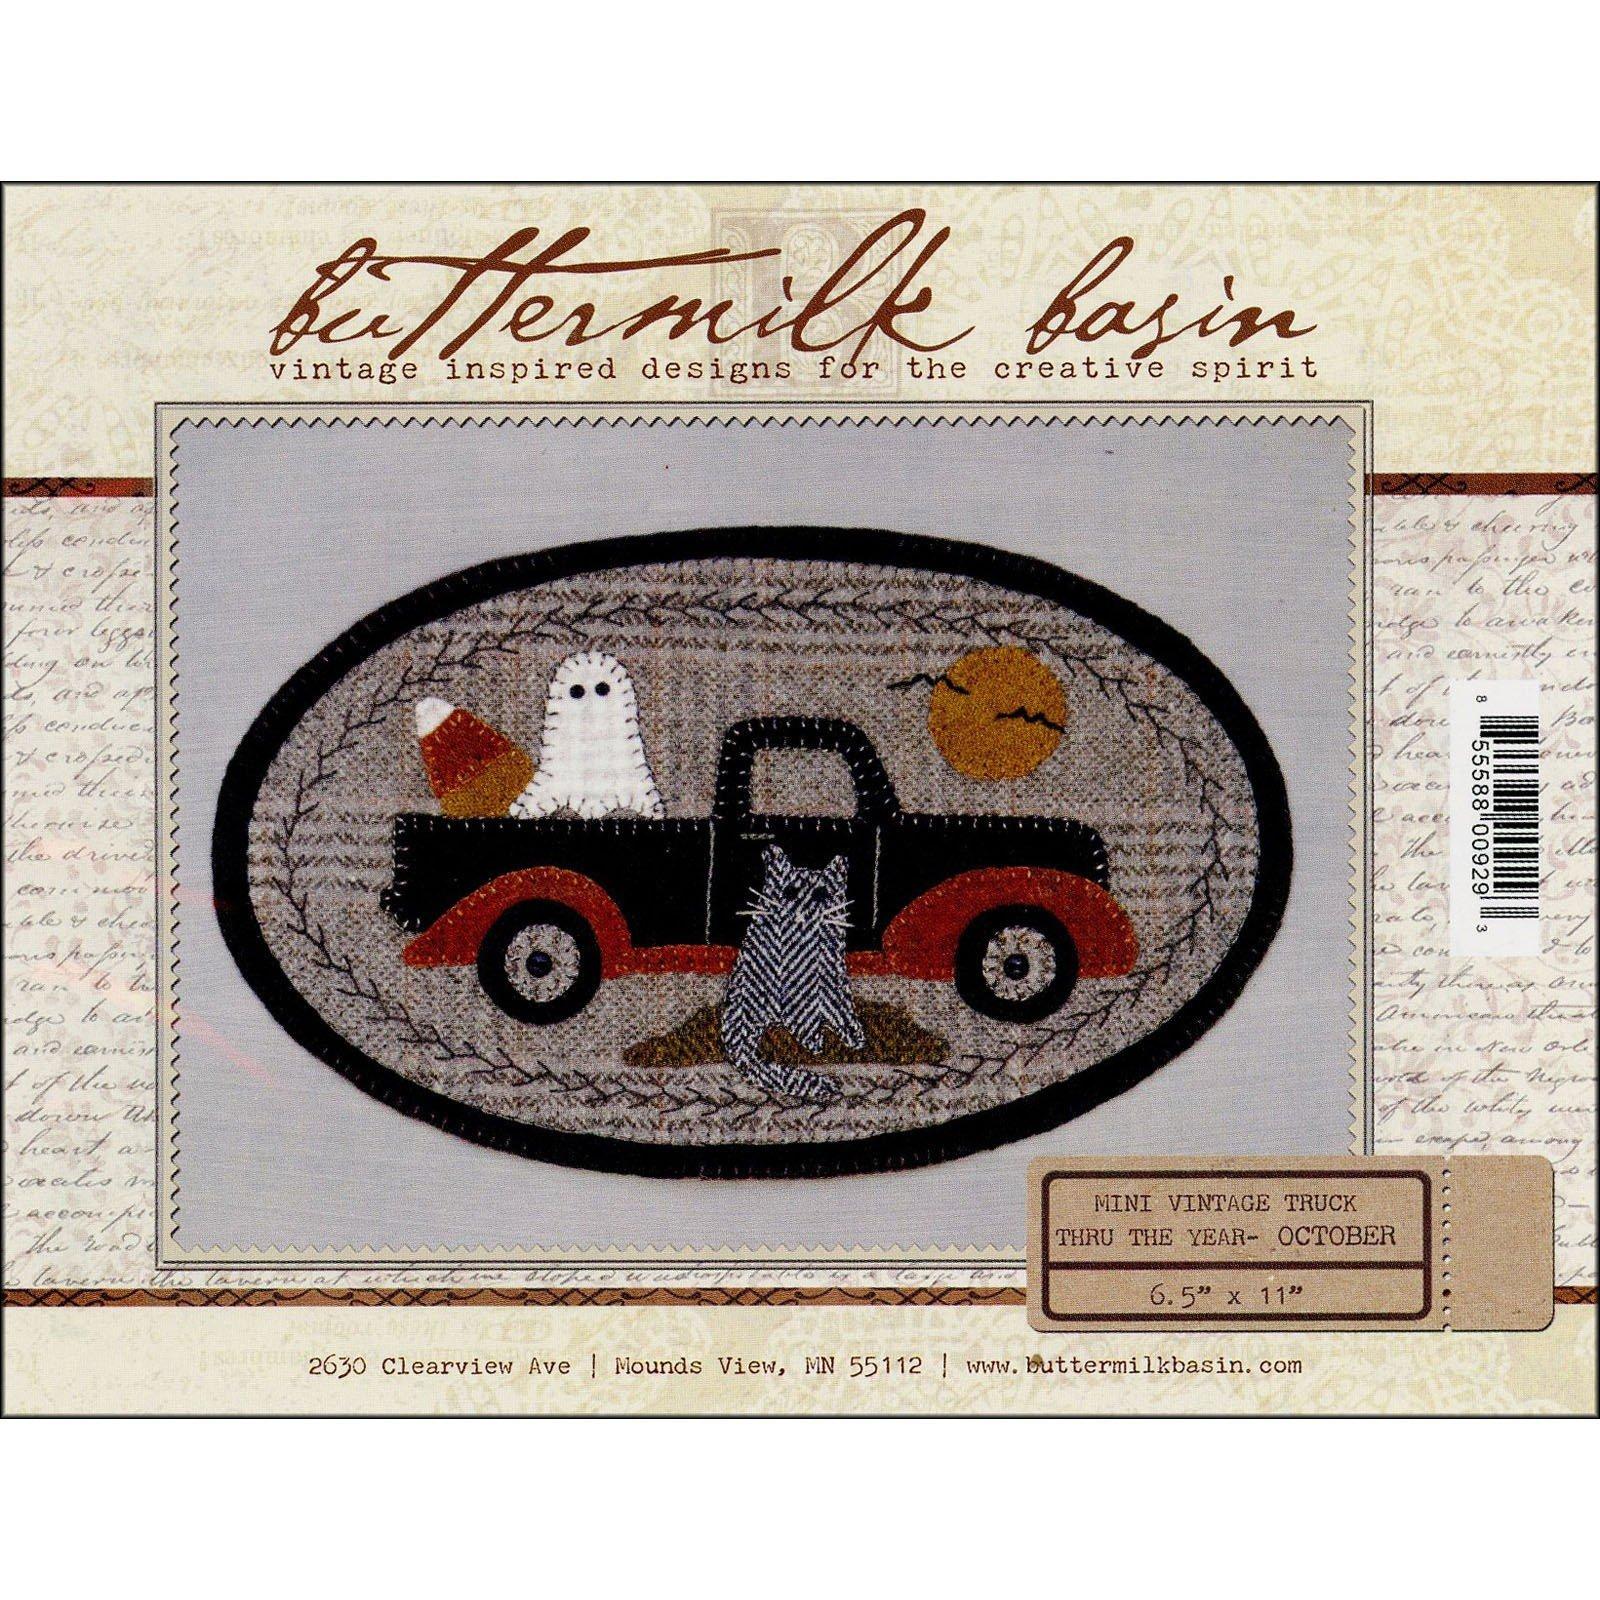 Buttermilk Basin Mini Vintage Truck Pattern-October